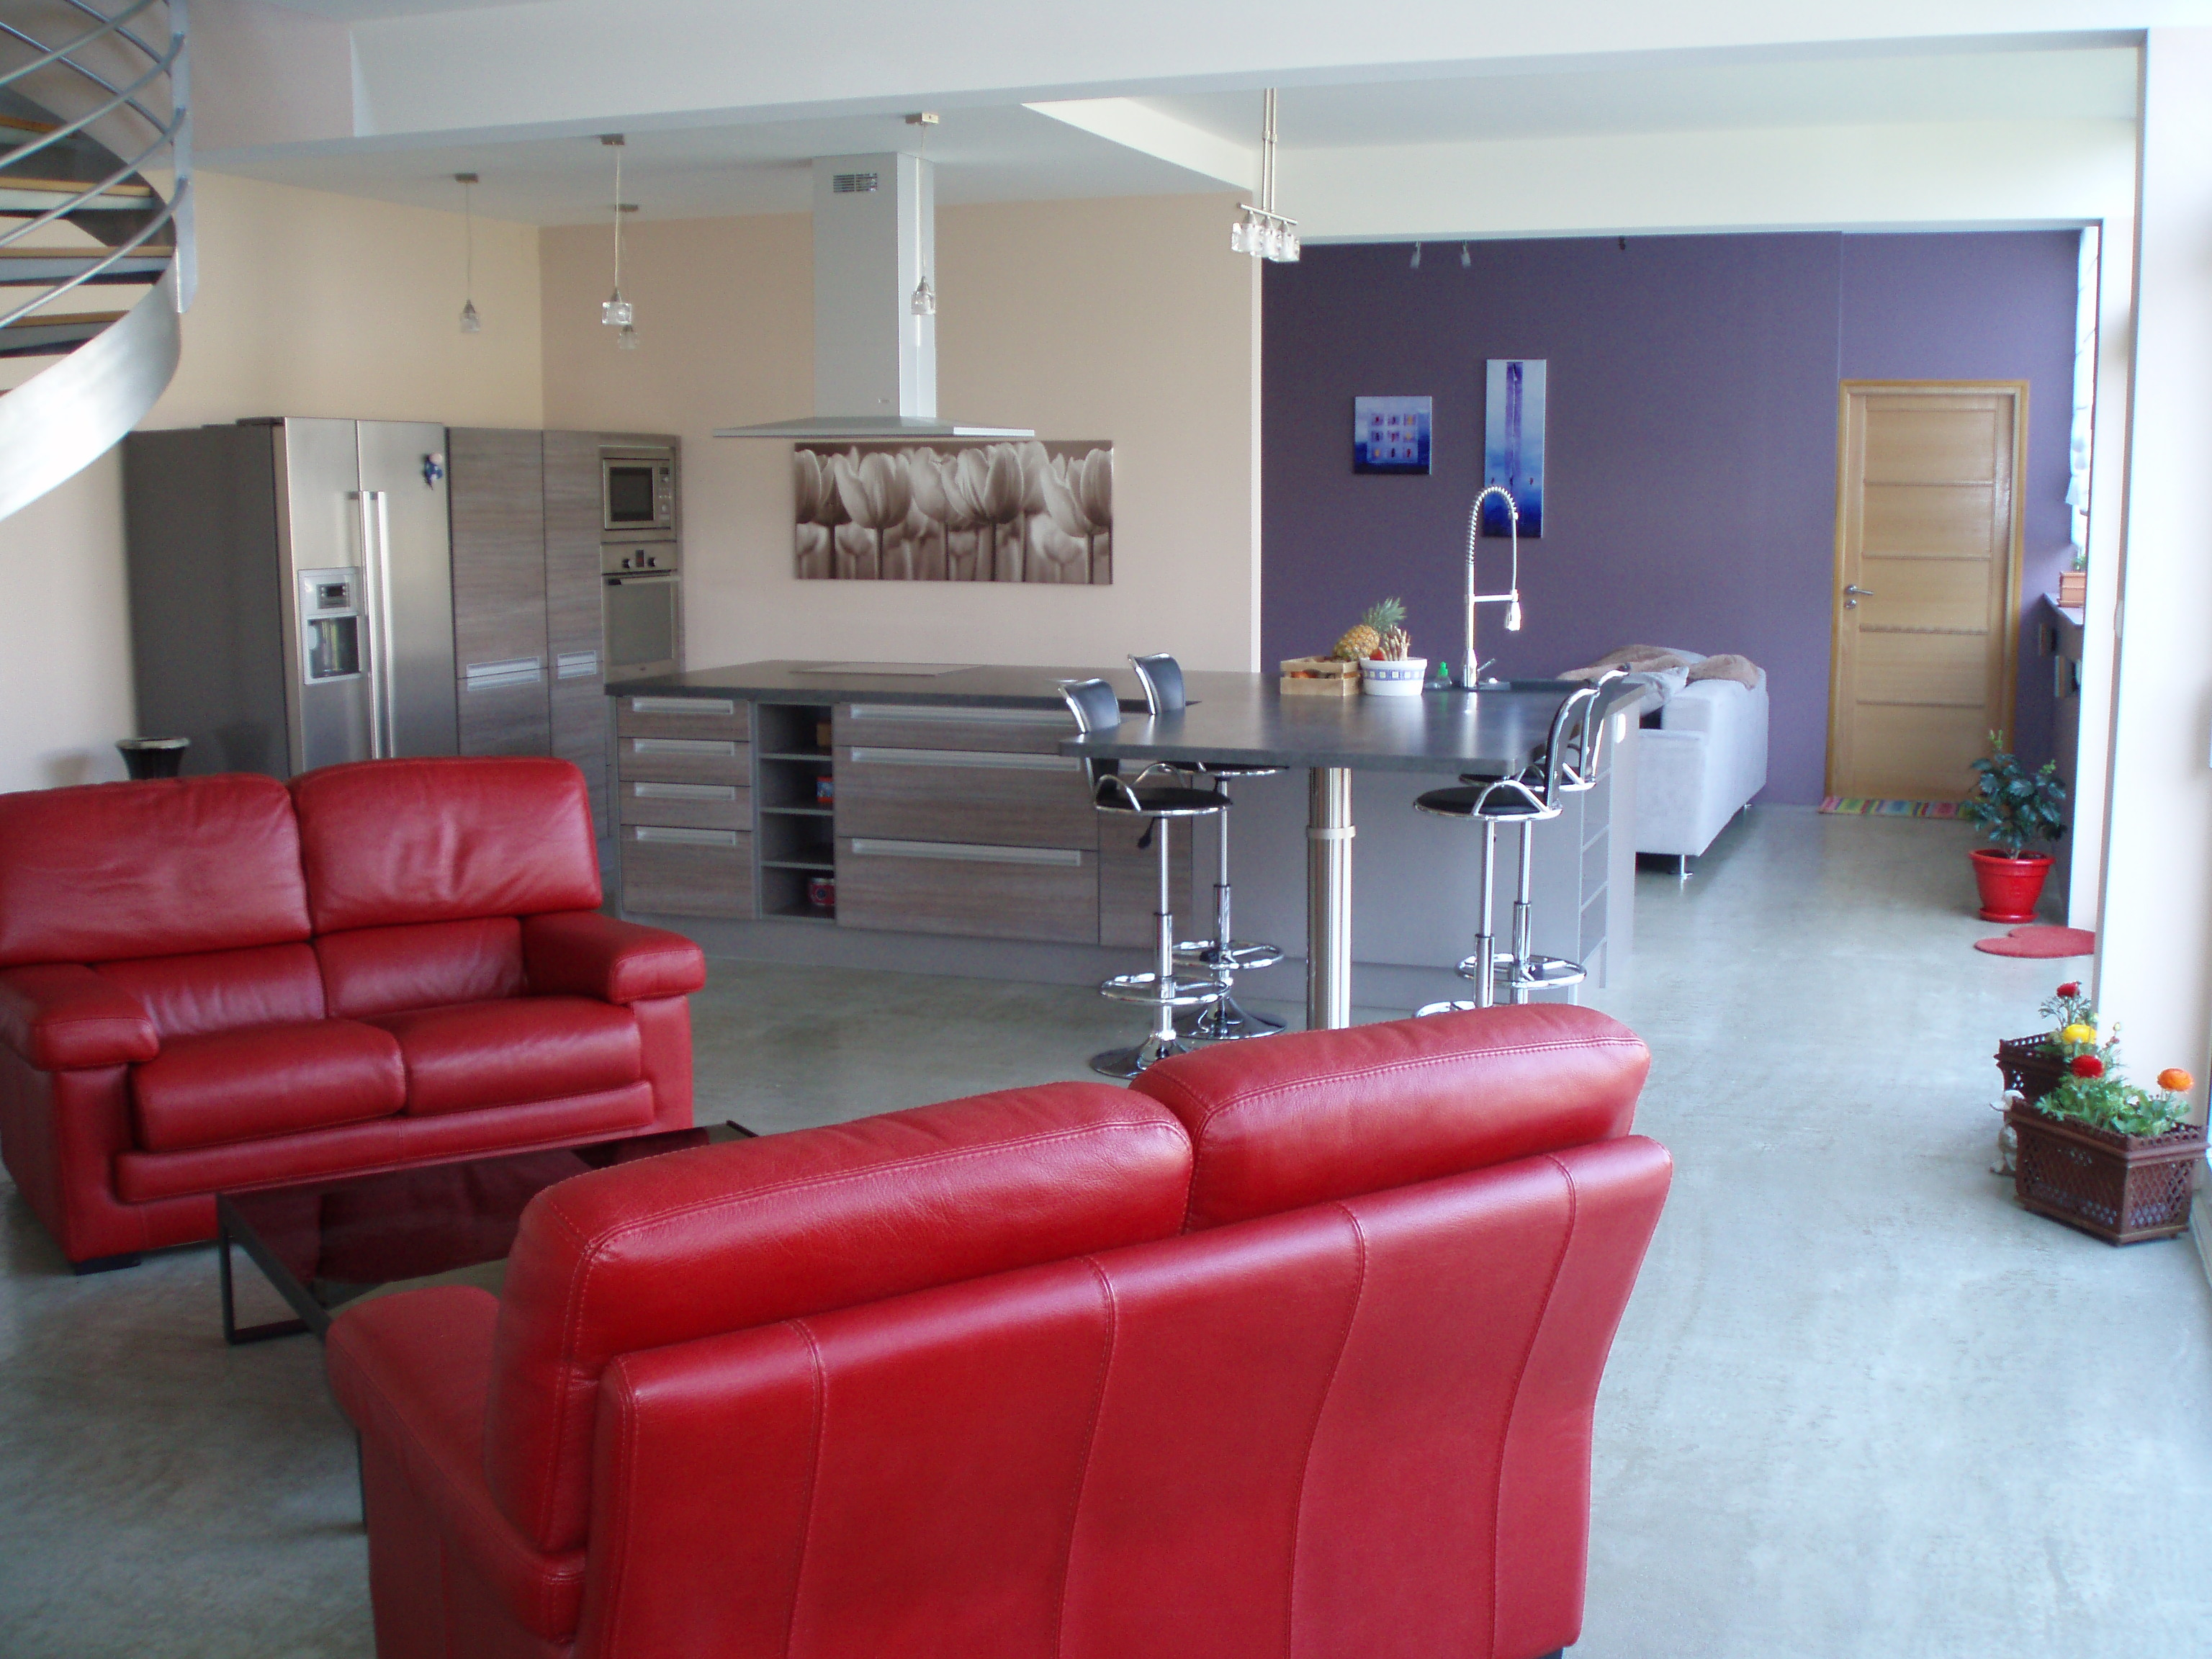 activ tendances r sine incolore aspect b ton cir. Black Bedroom Furniture Sets. Home Design Ideas